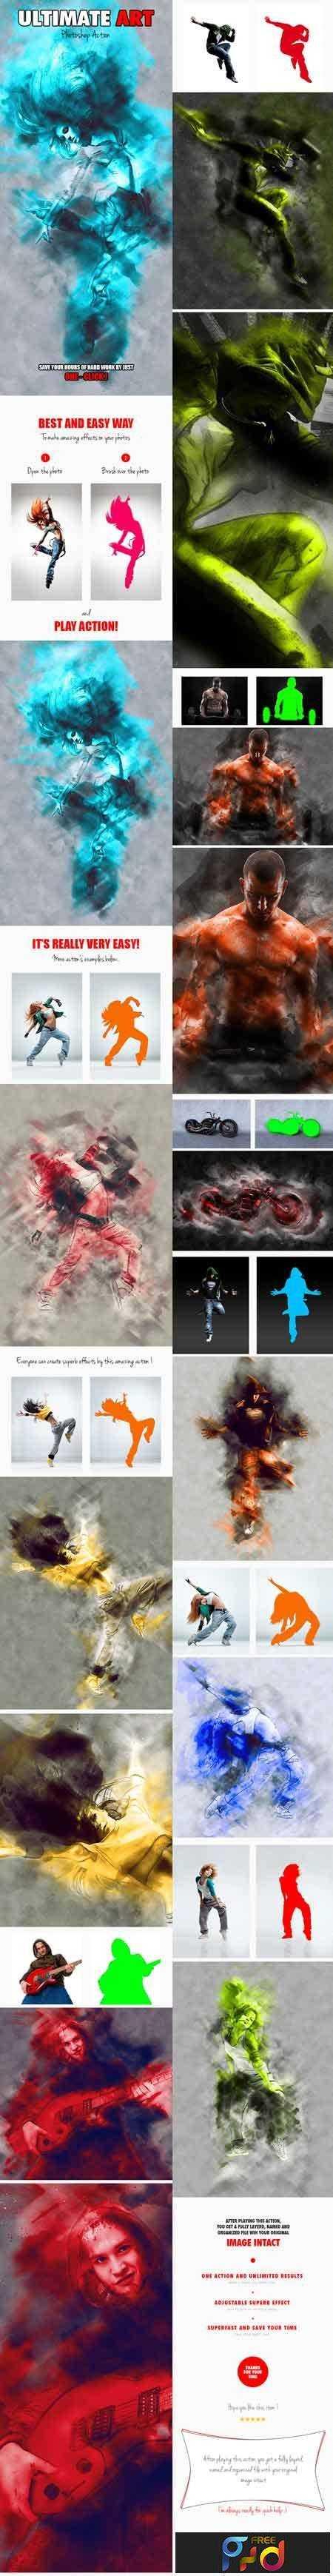 freepsdvn-com_1468344357_ultimate-art-photoshop-action-16953759